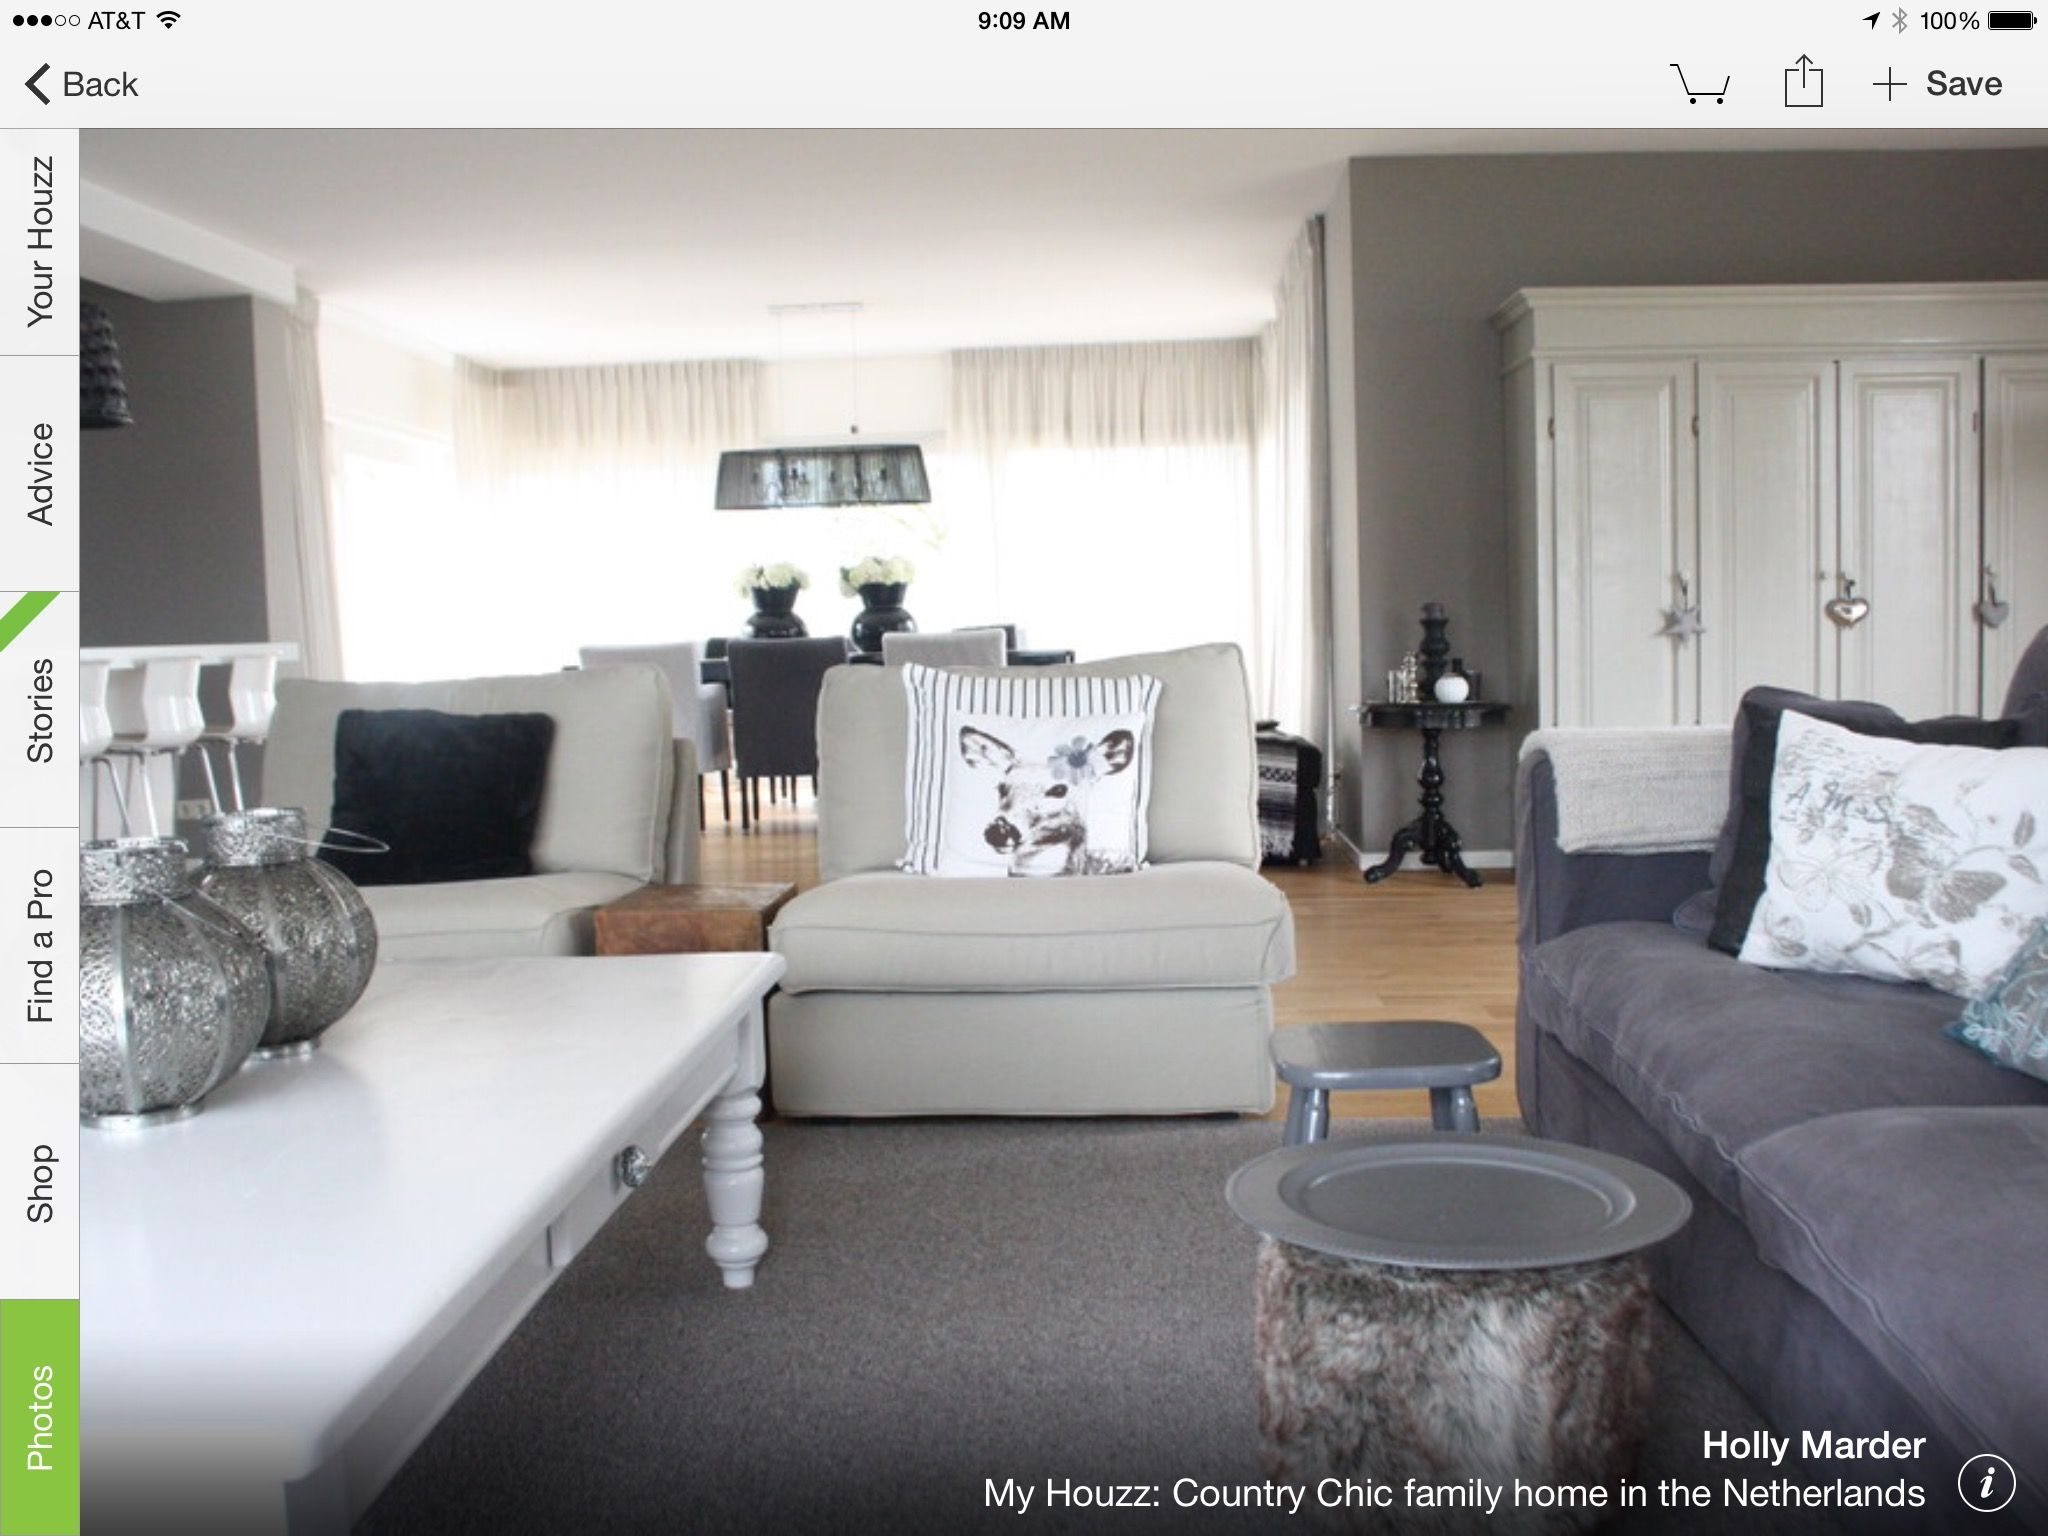 Pin by Linda Joyner on Living Room | Pinterest | Living rooms and Room